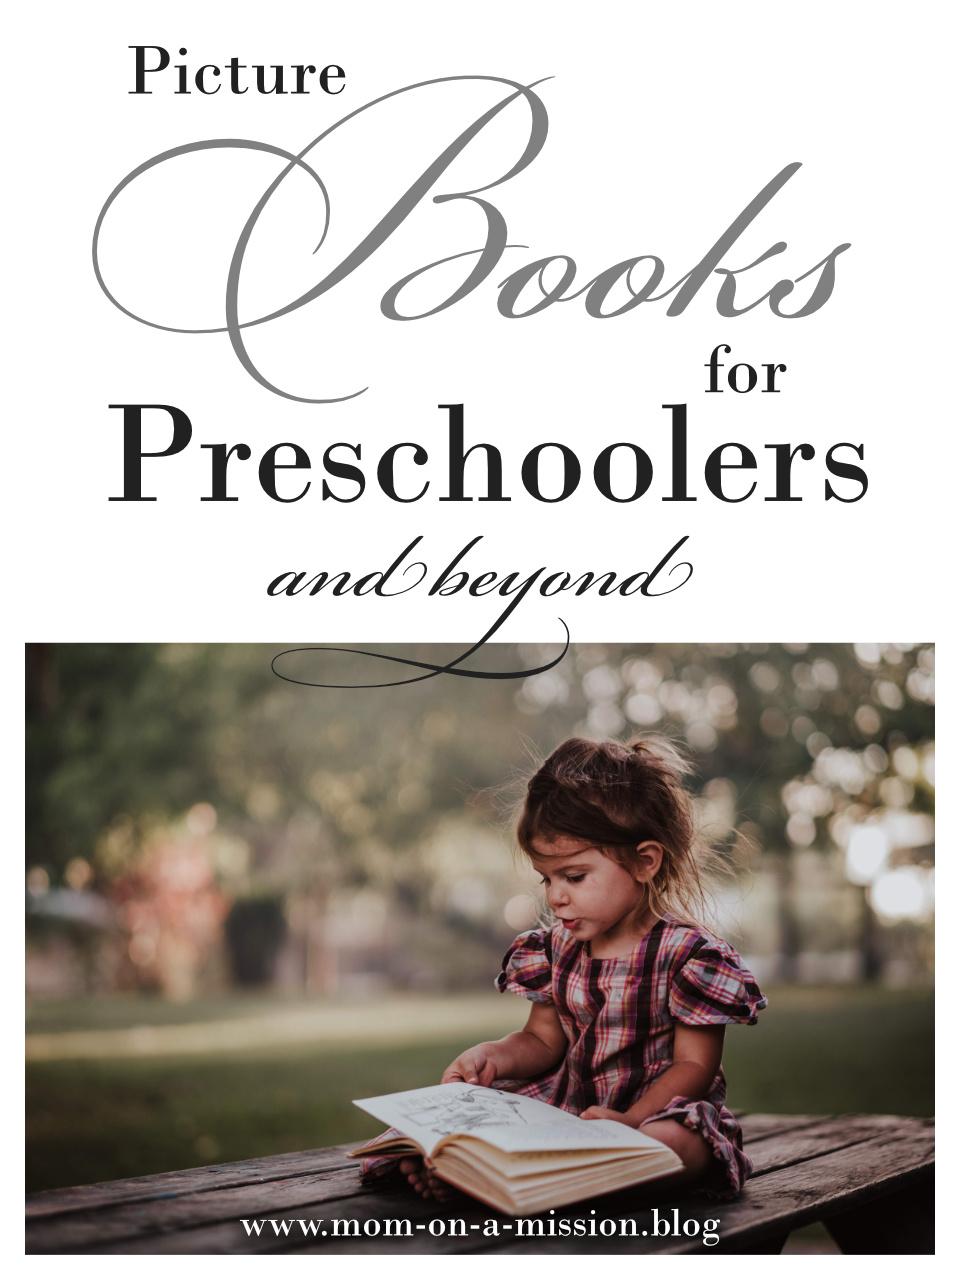 Picture Books for Preschoolers #momonamissionblog #picturebooks #readaloud